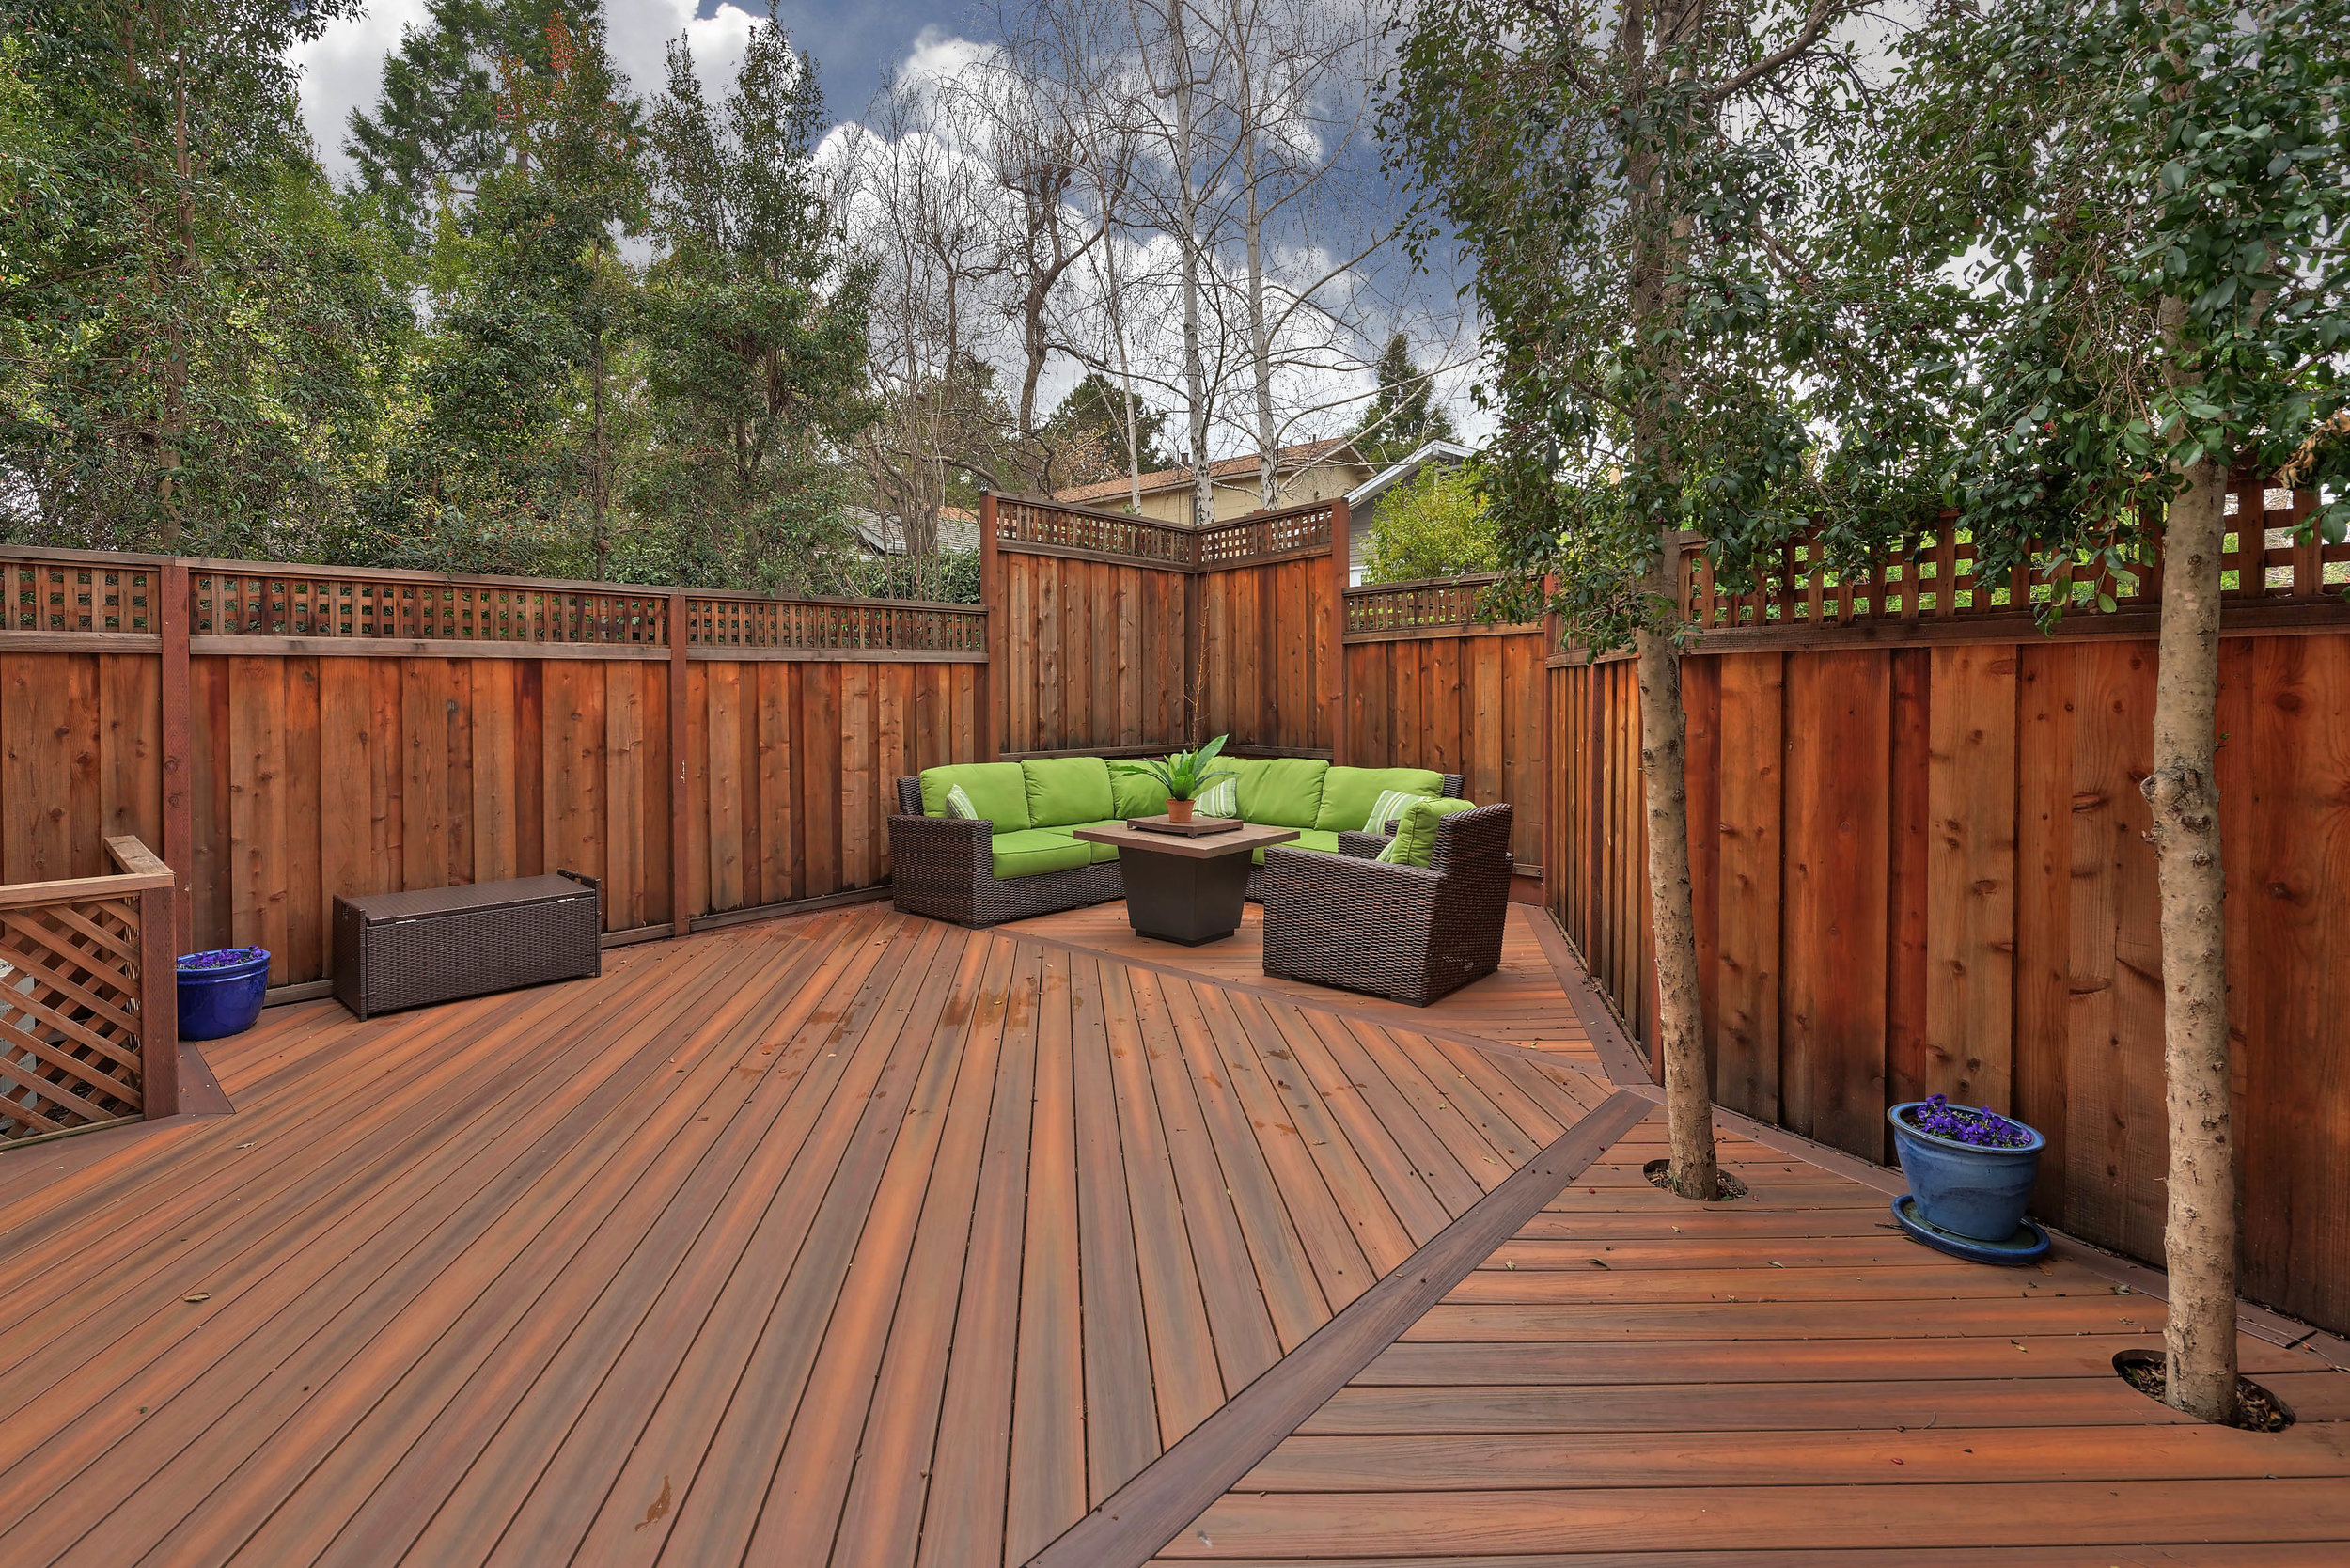 NBack3_100 Boyer Ln_Ducky Grabill Real Estate.jpg